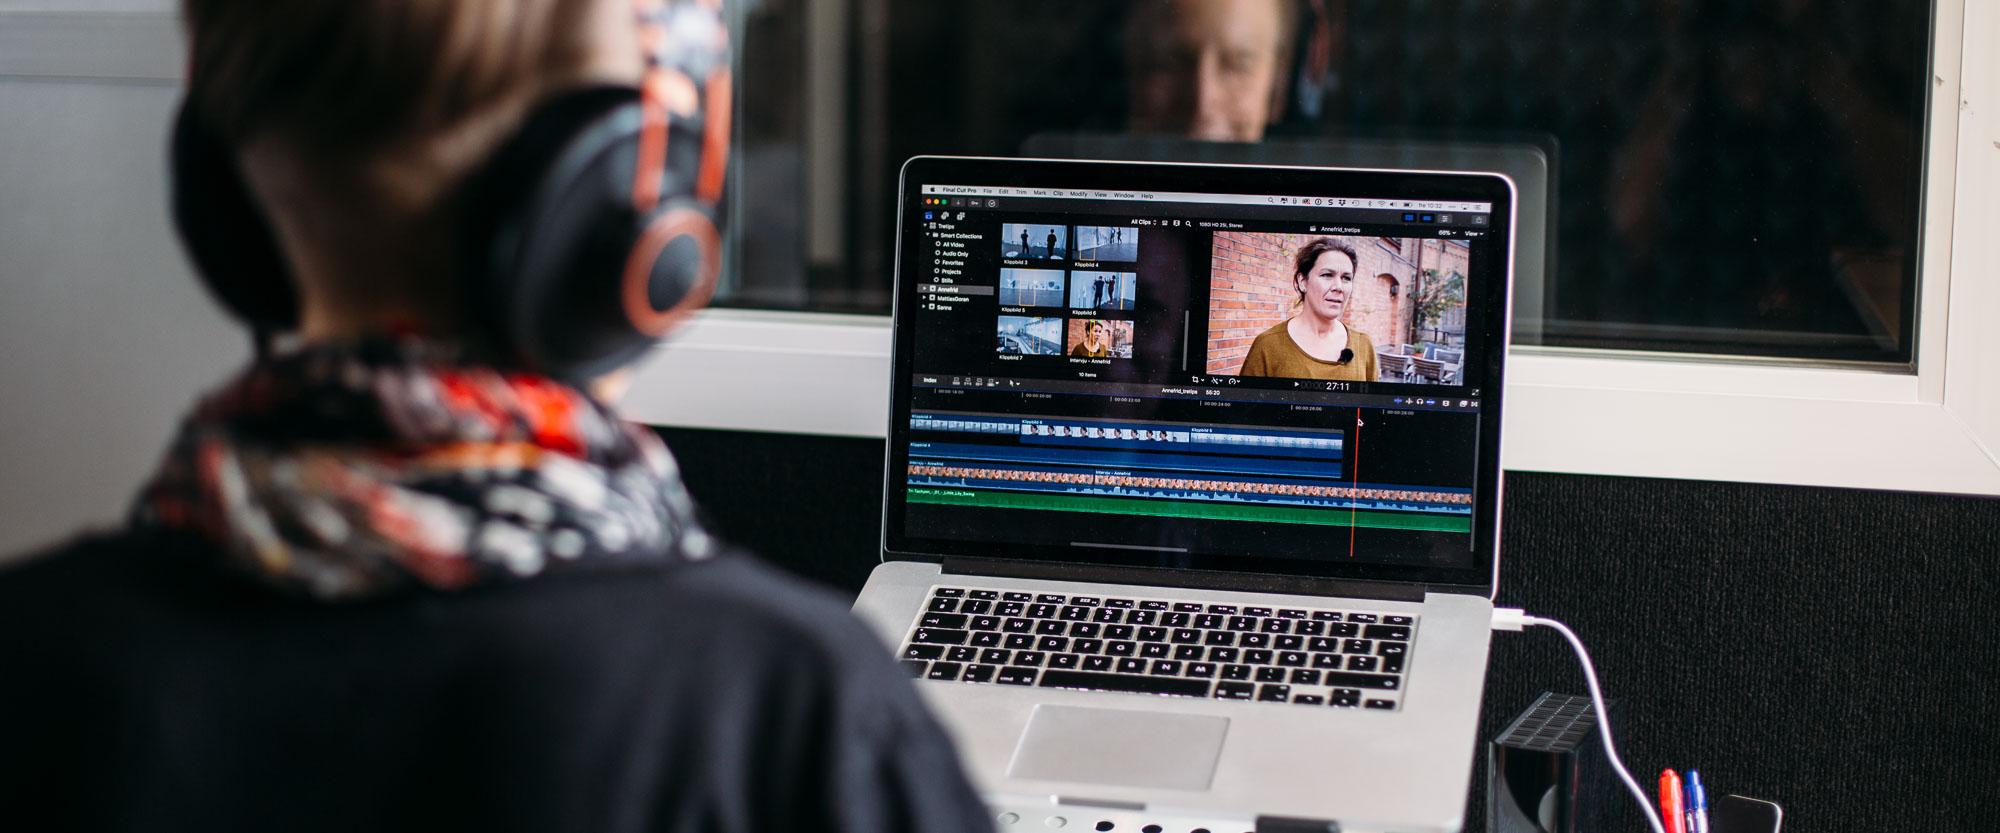 Onlinekurs Videoredigera med Final Cut Pro X